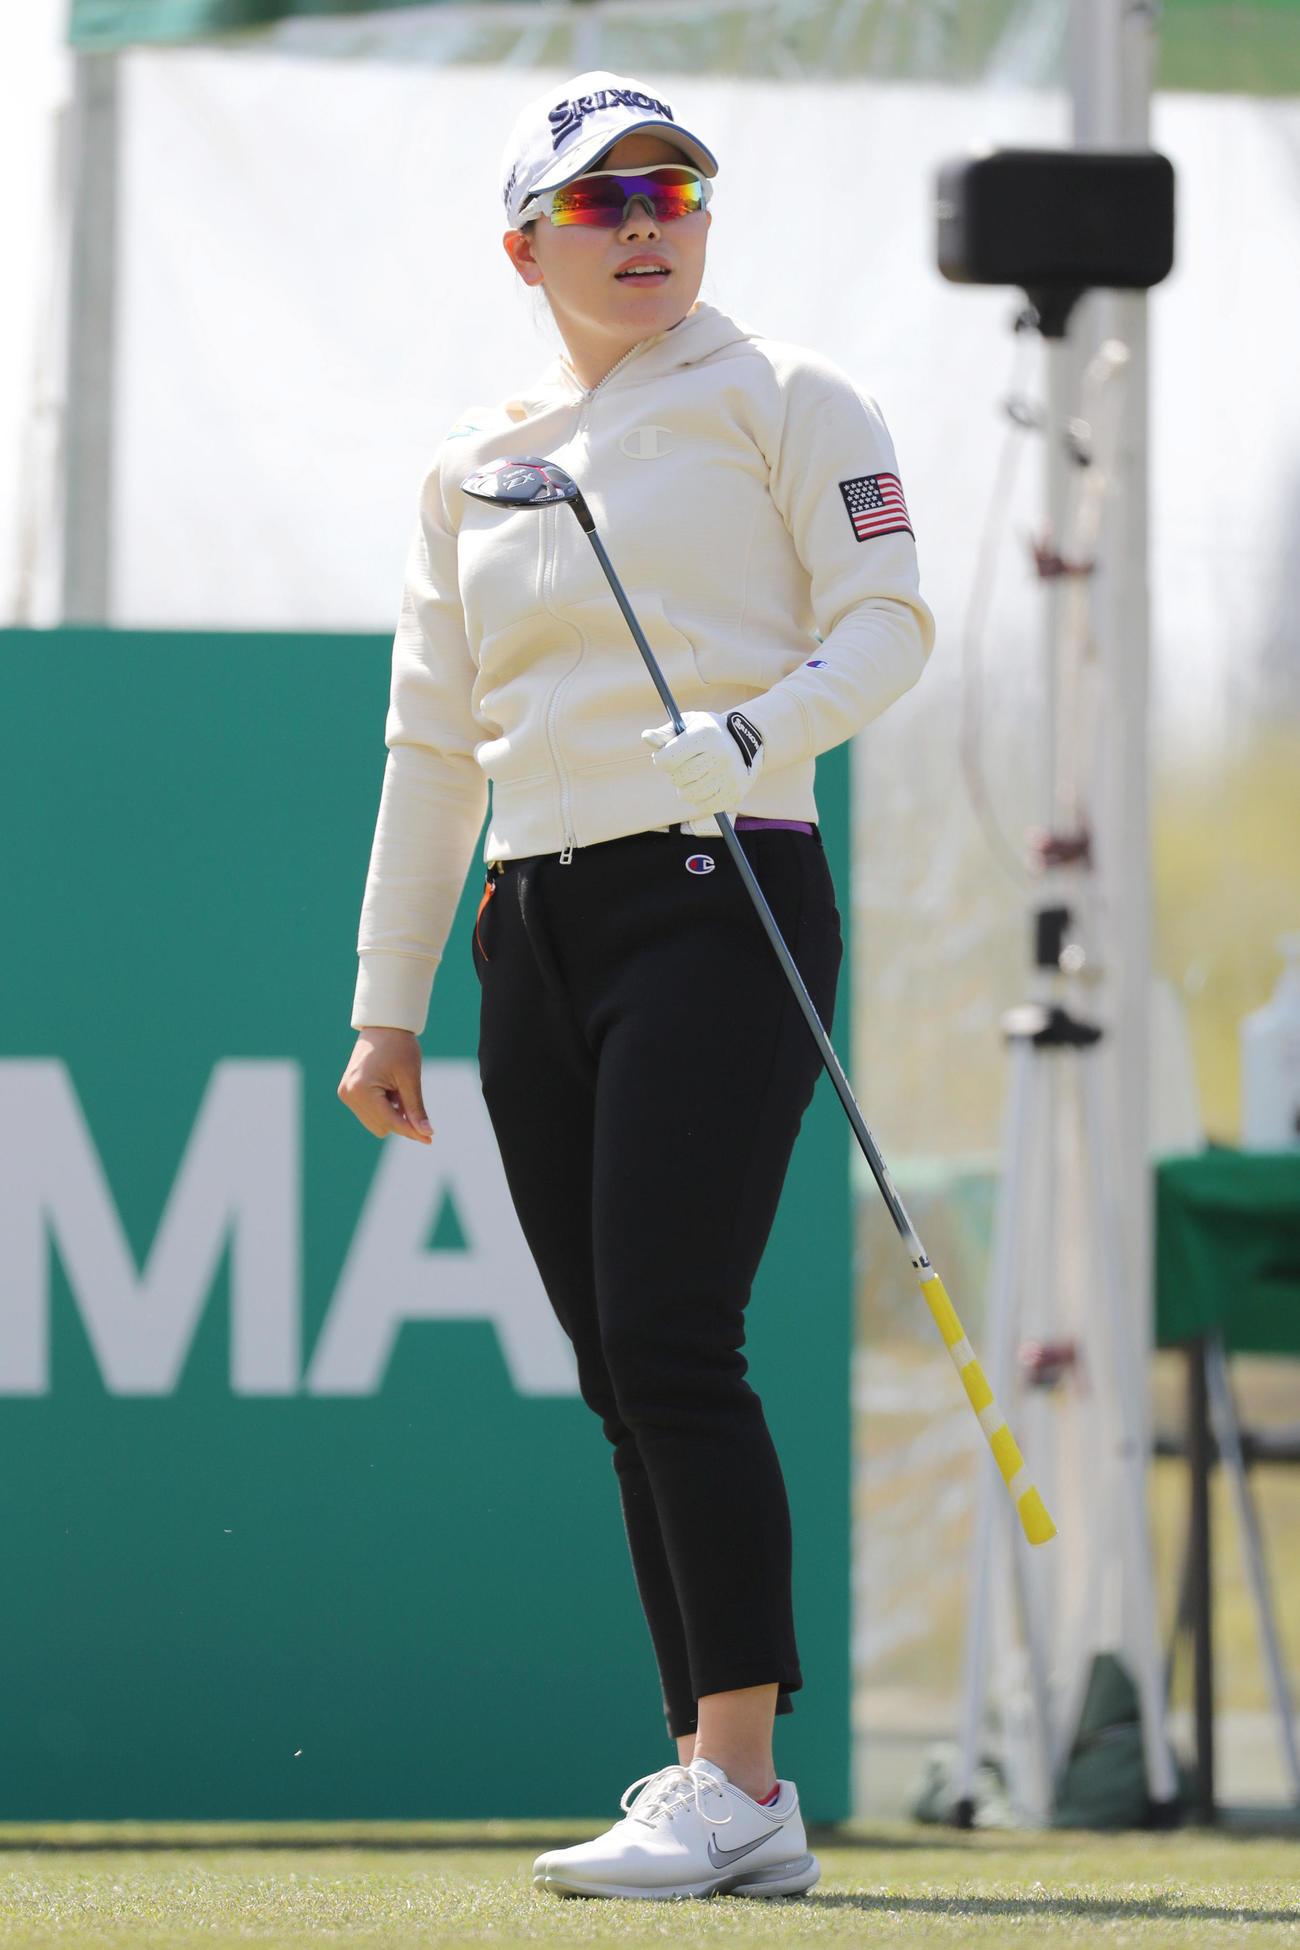 https://www.nikkansports.com/sports/golf/news/img/202103110000496-w1300_0.jpg